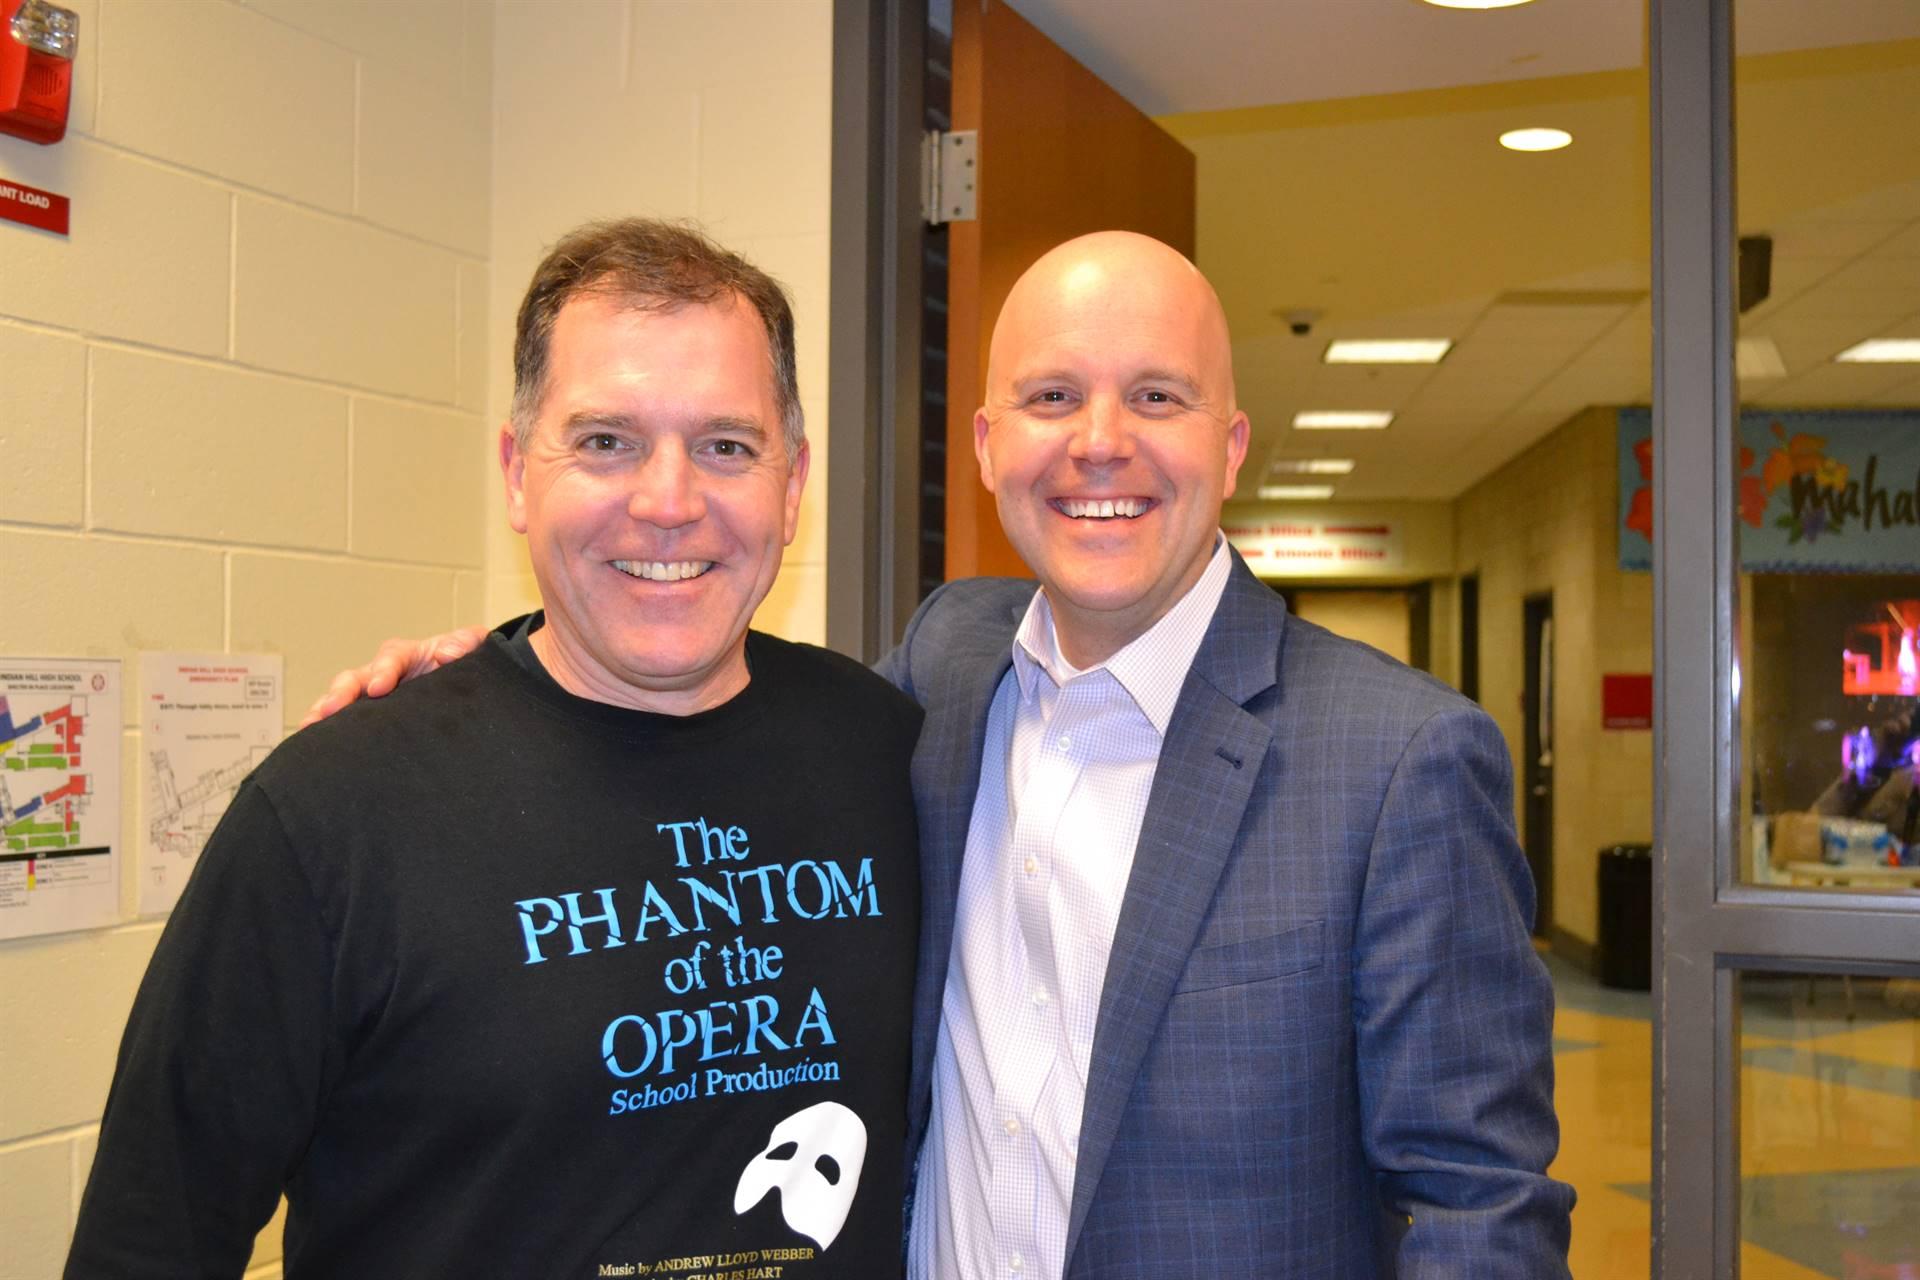 Rob Warfel and Mark Miles